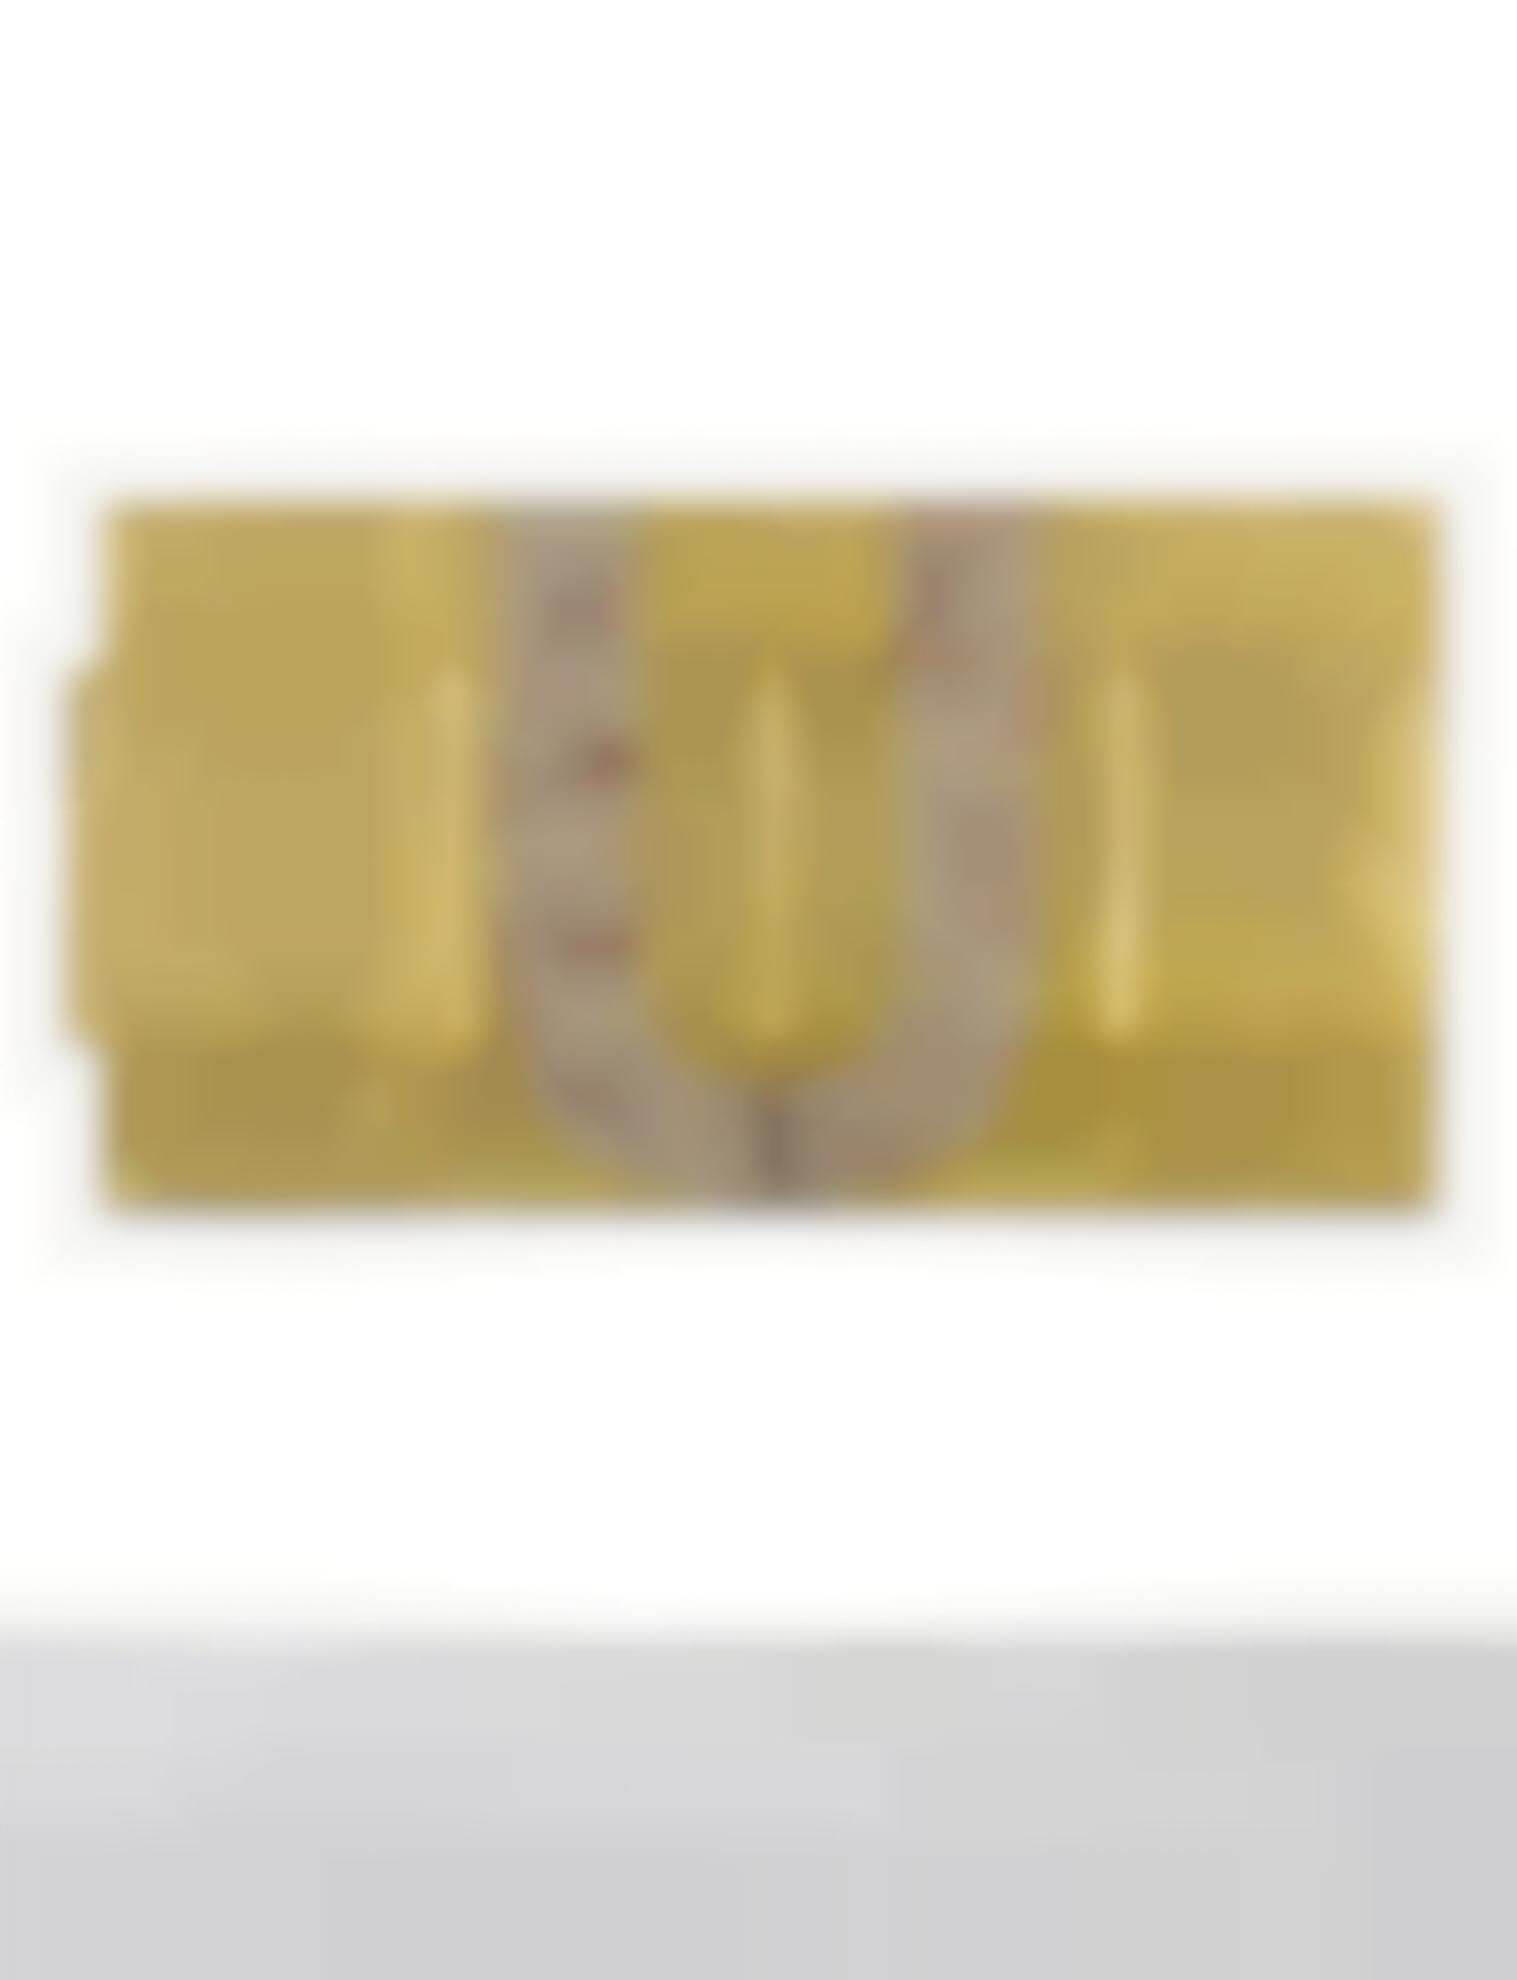 Danh Vo-Alphabet (U)-2011